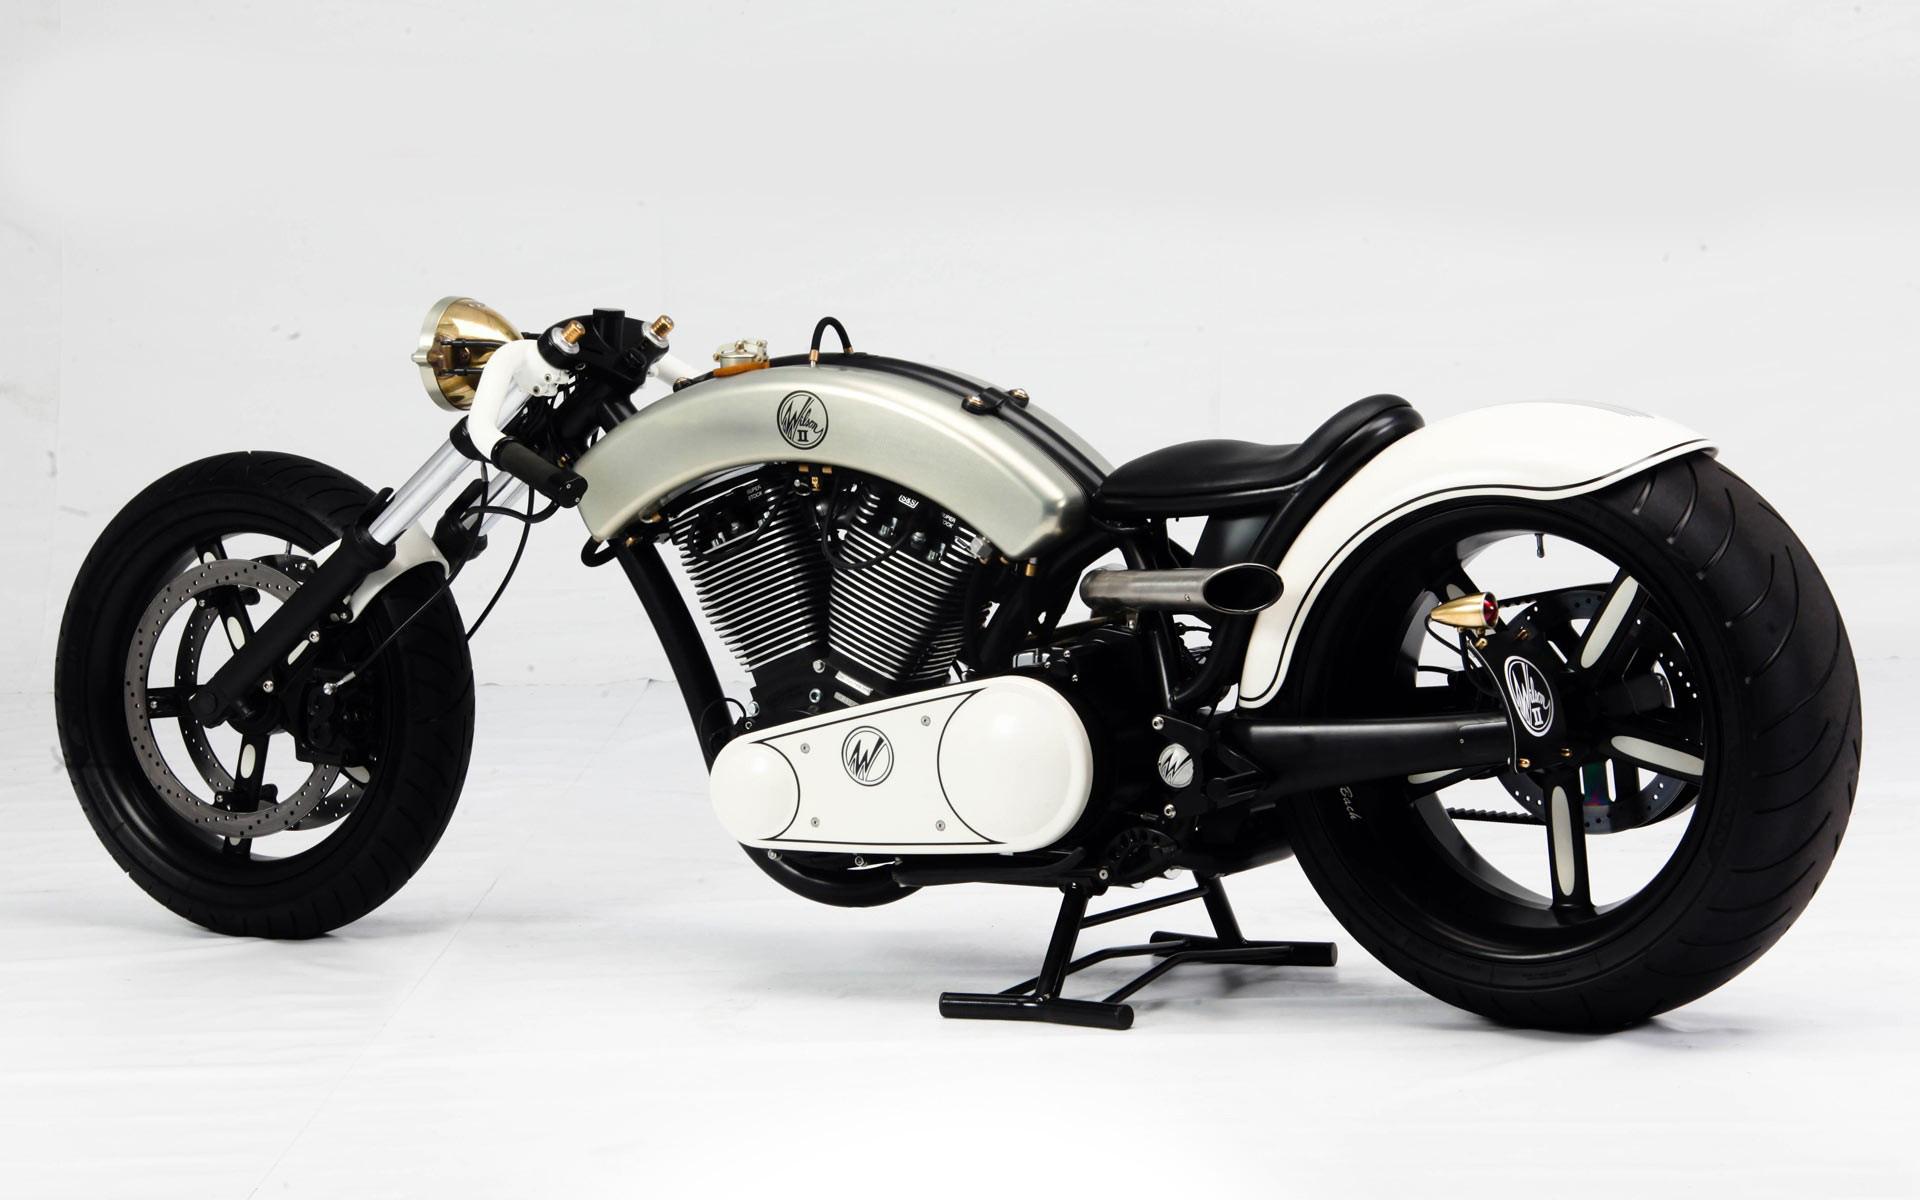 Bike Design Chopper Wheels Custom Wallpaper 1920x1200 117476